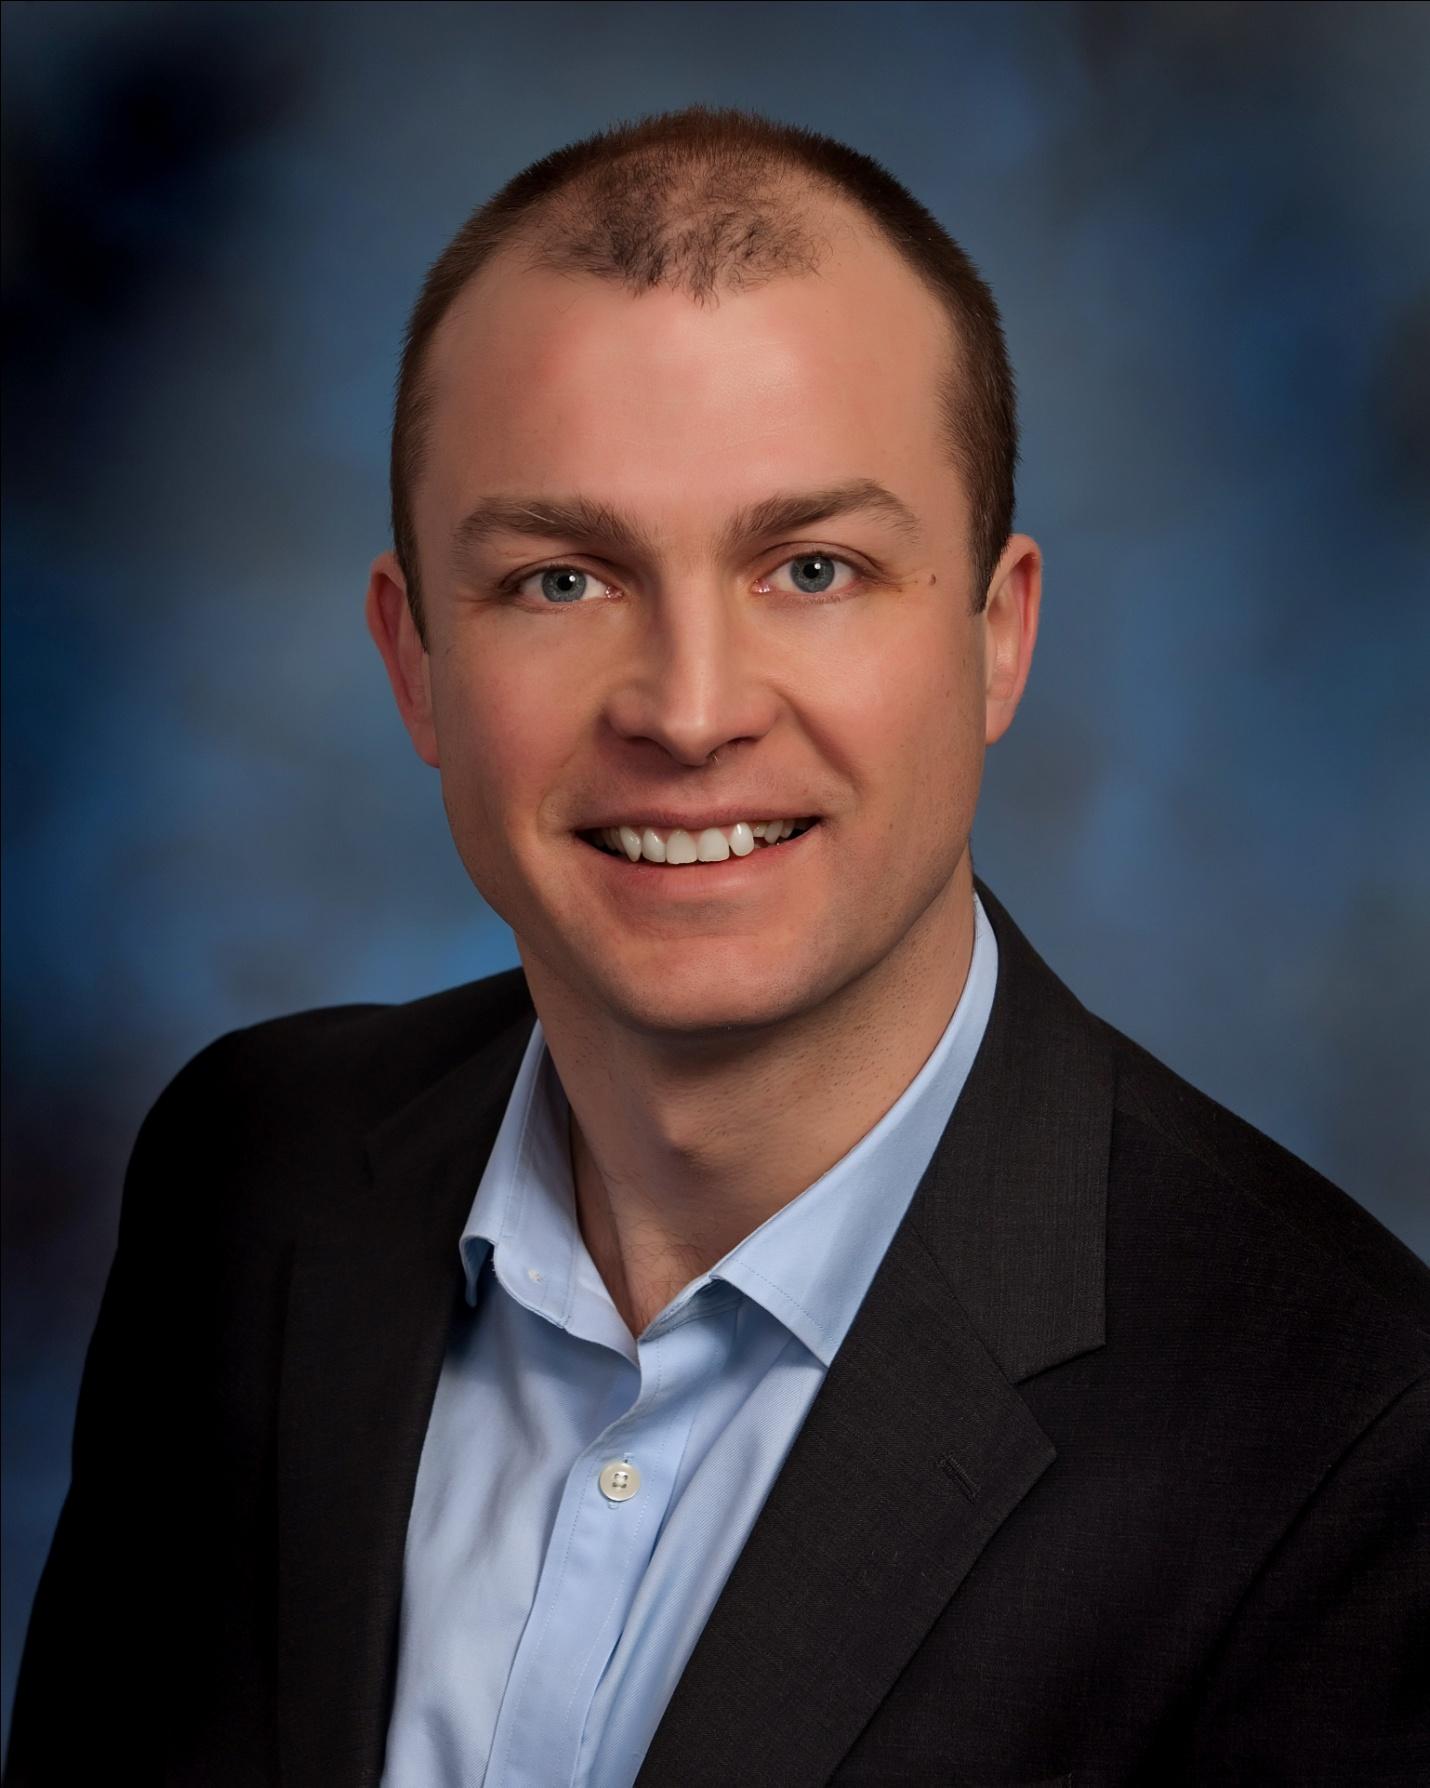 Dr. Jonathan Cheetham